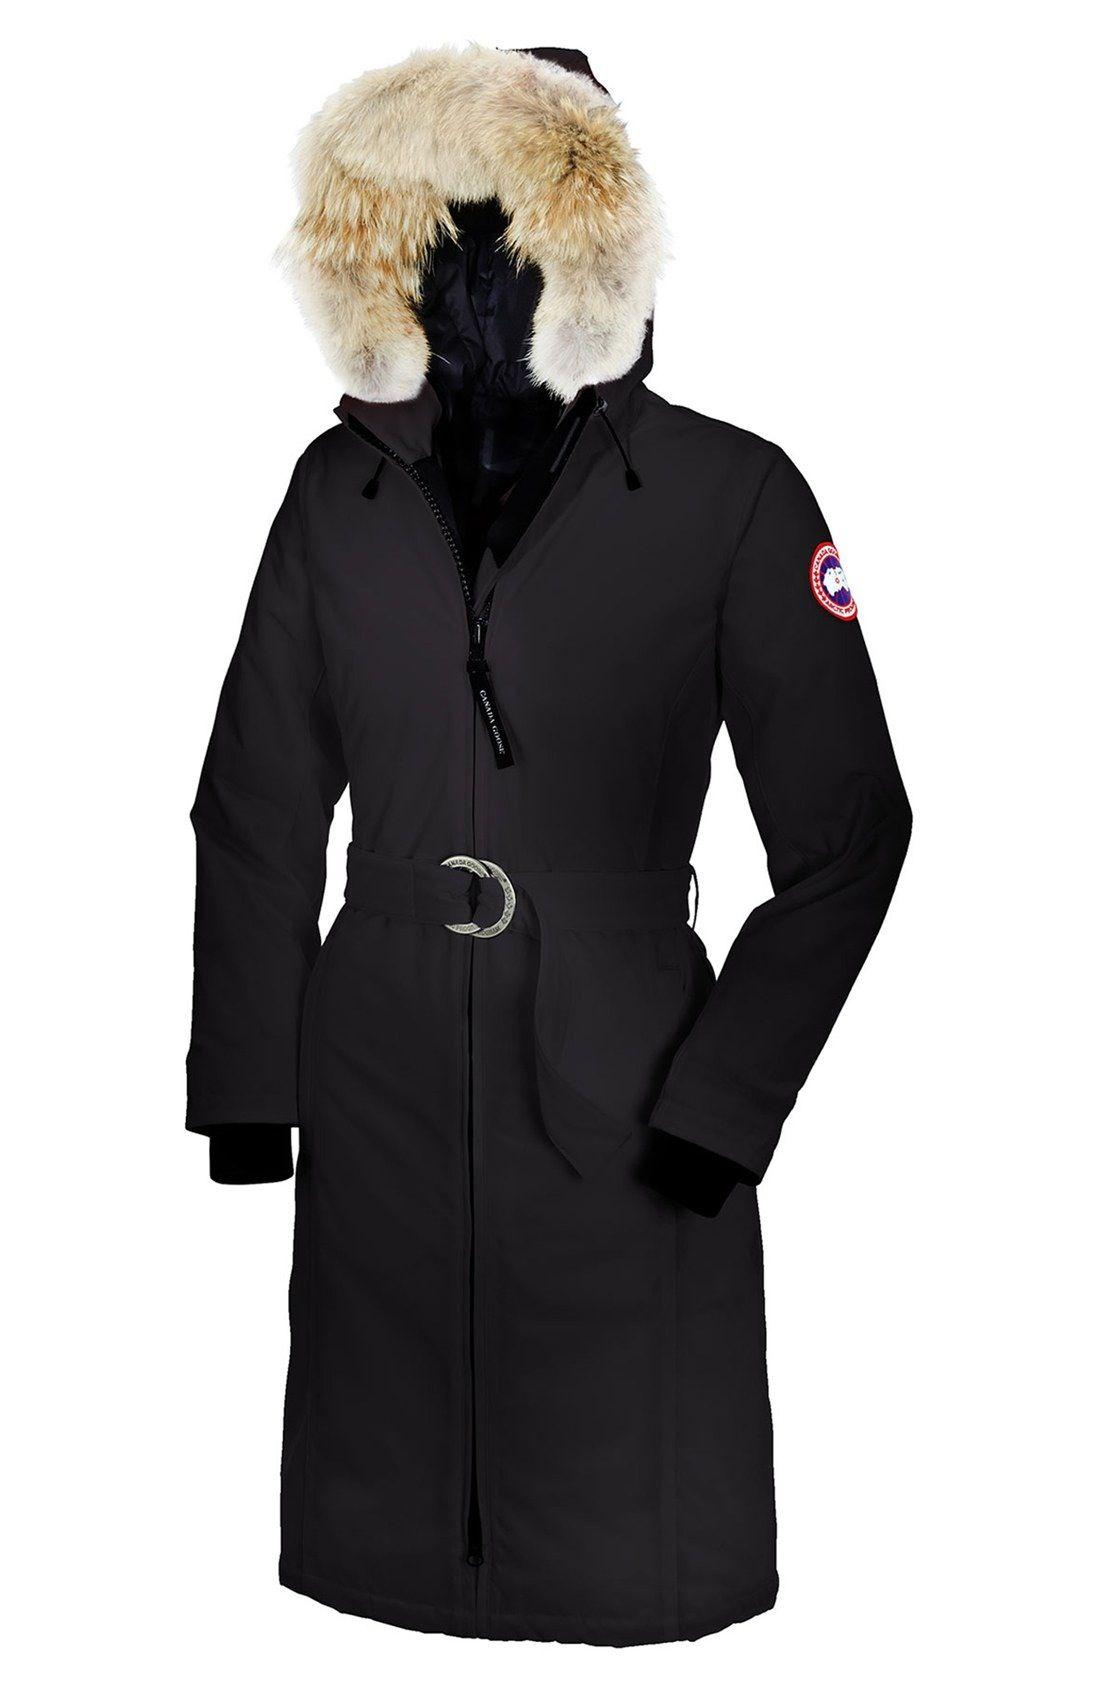 Canada Goose Womens Winter jacket